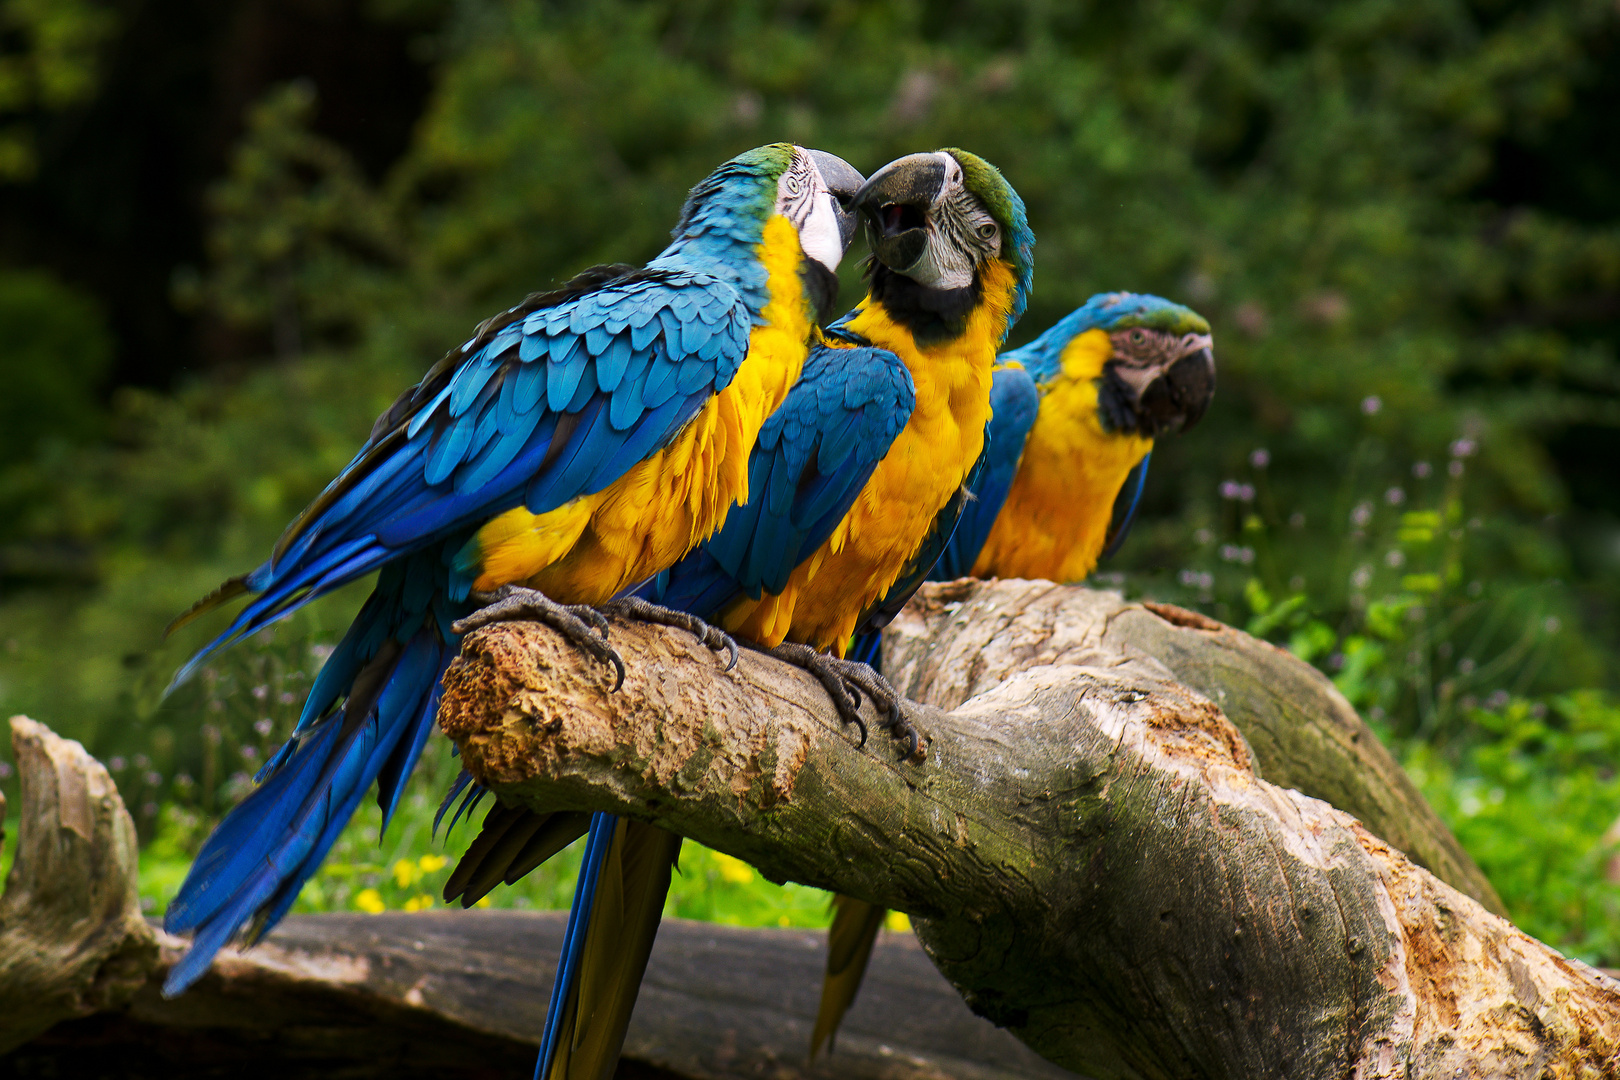 3 papageien foto & bild | tiere, tierfreundschaften, natur